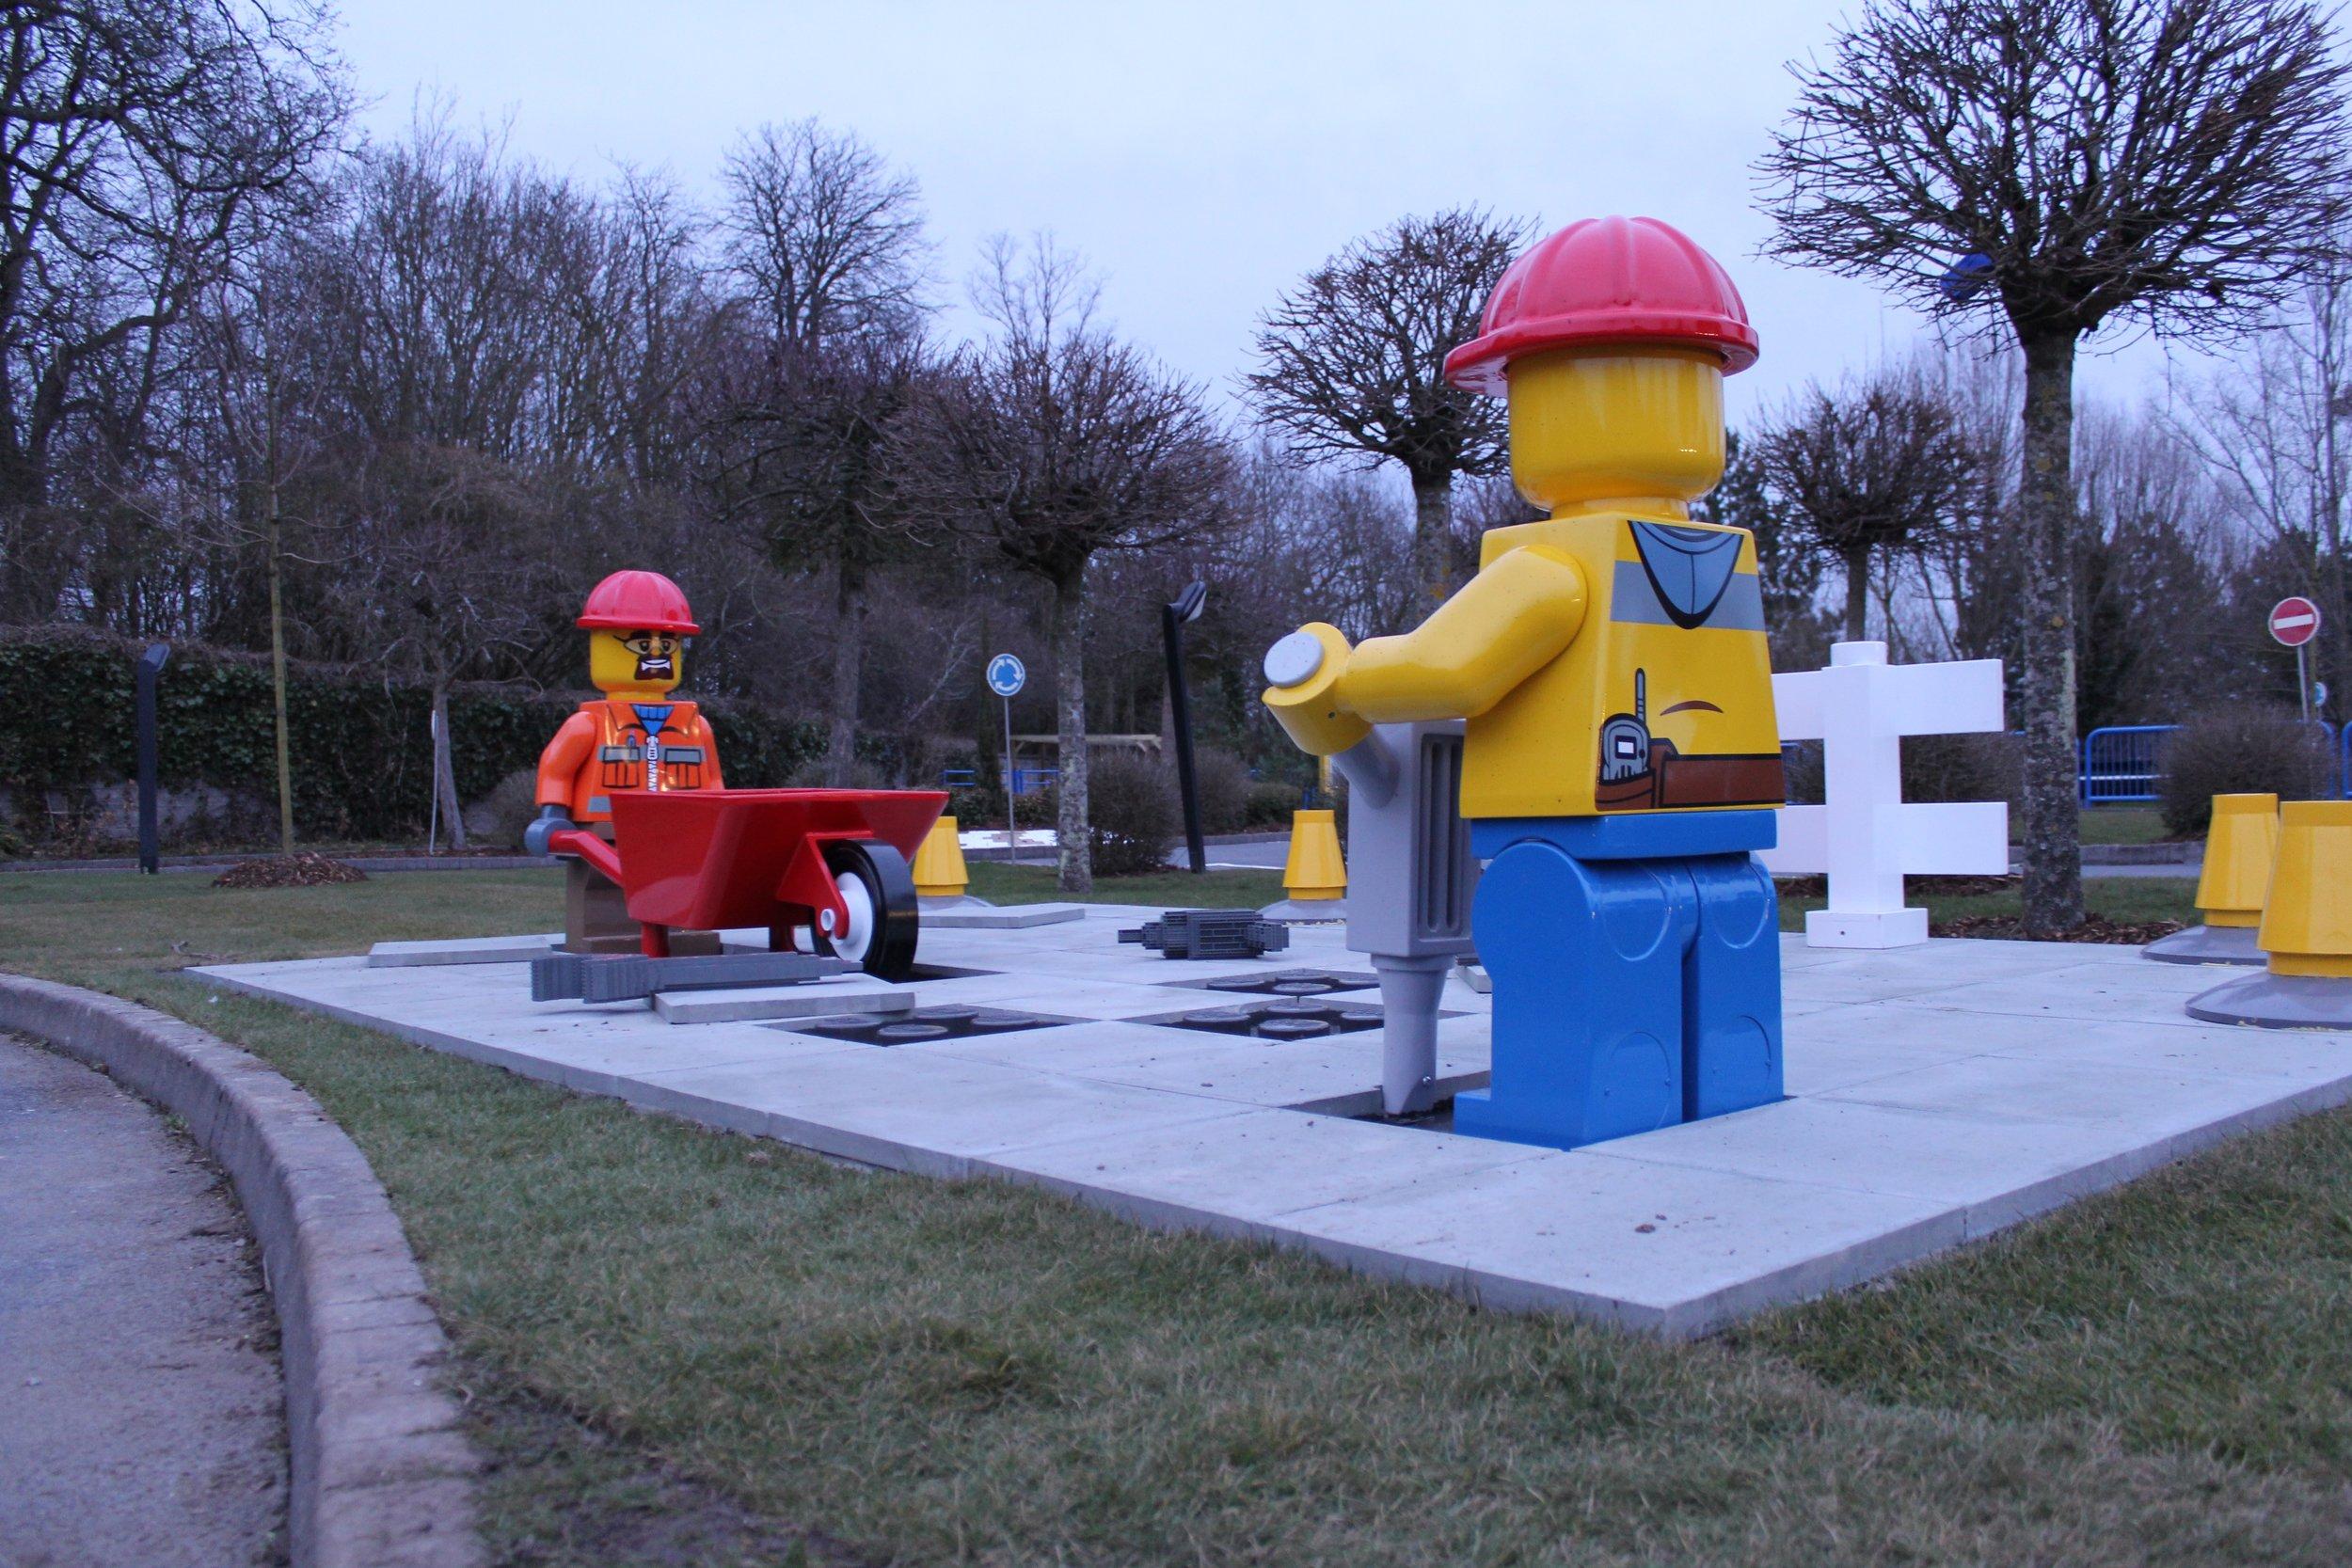 lego land lego city 2.jpg